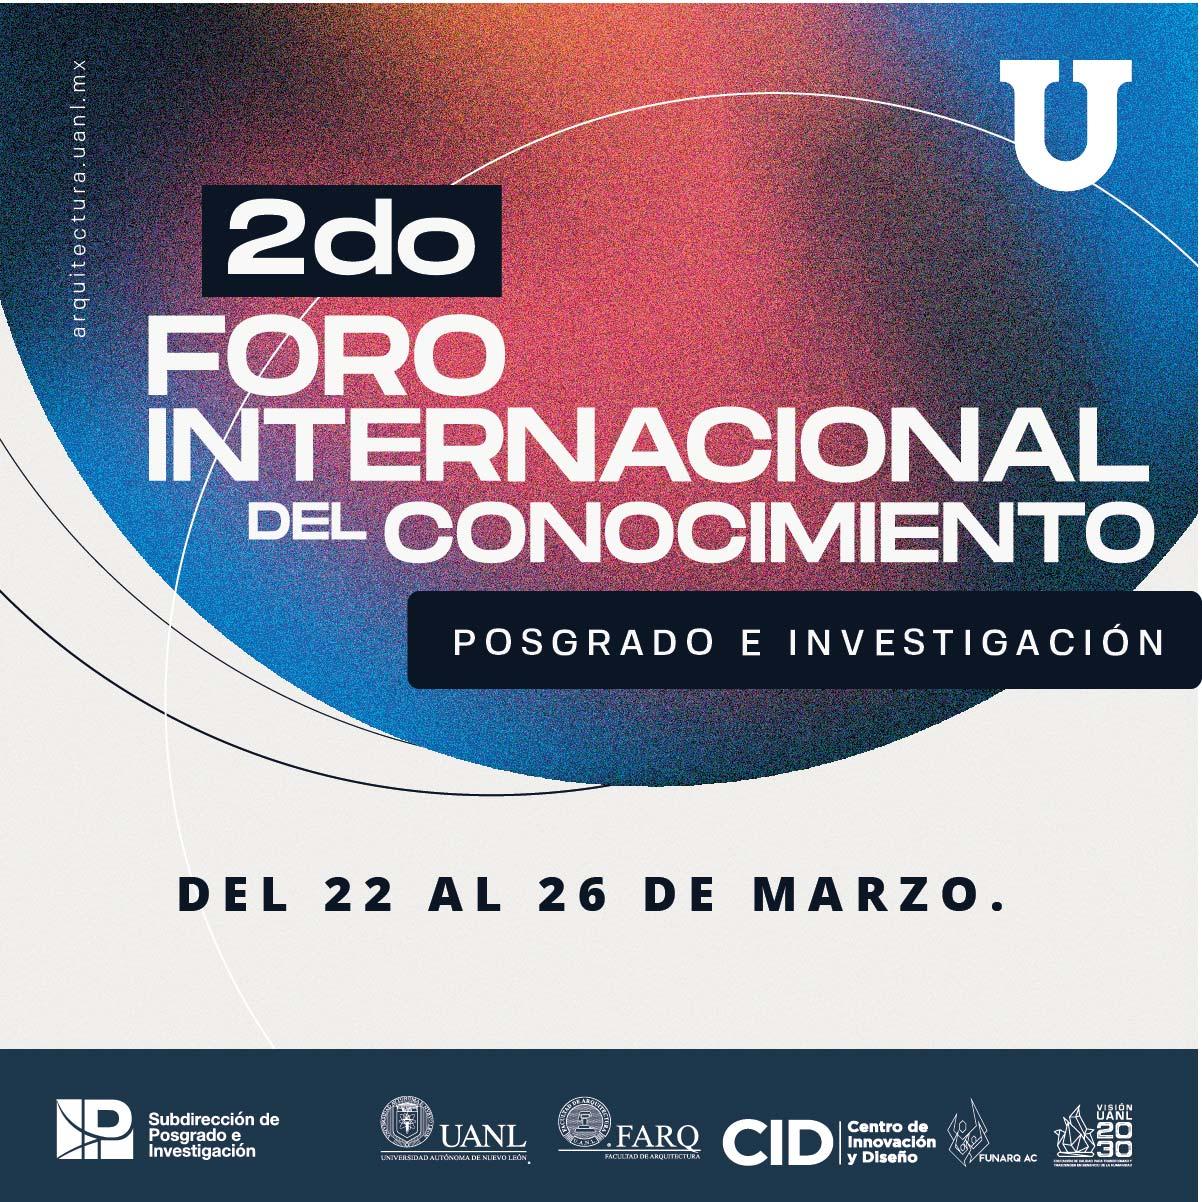 2do. Foro Internacional del Conocimiento Posgrado e Investigación